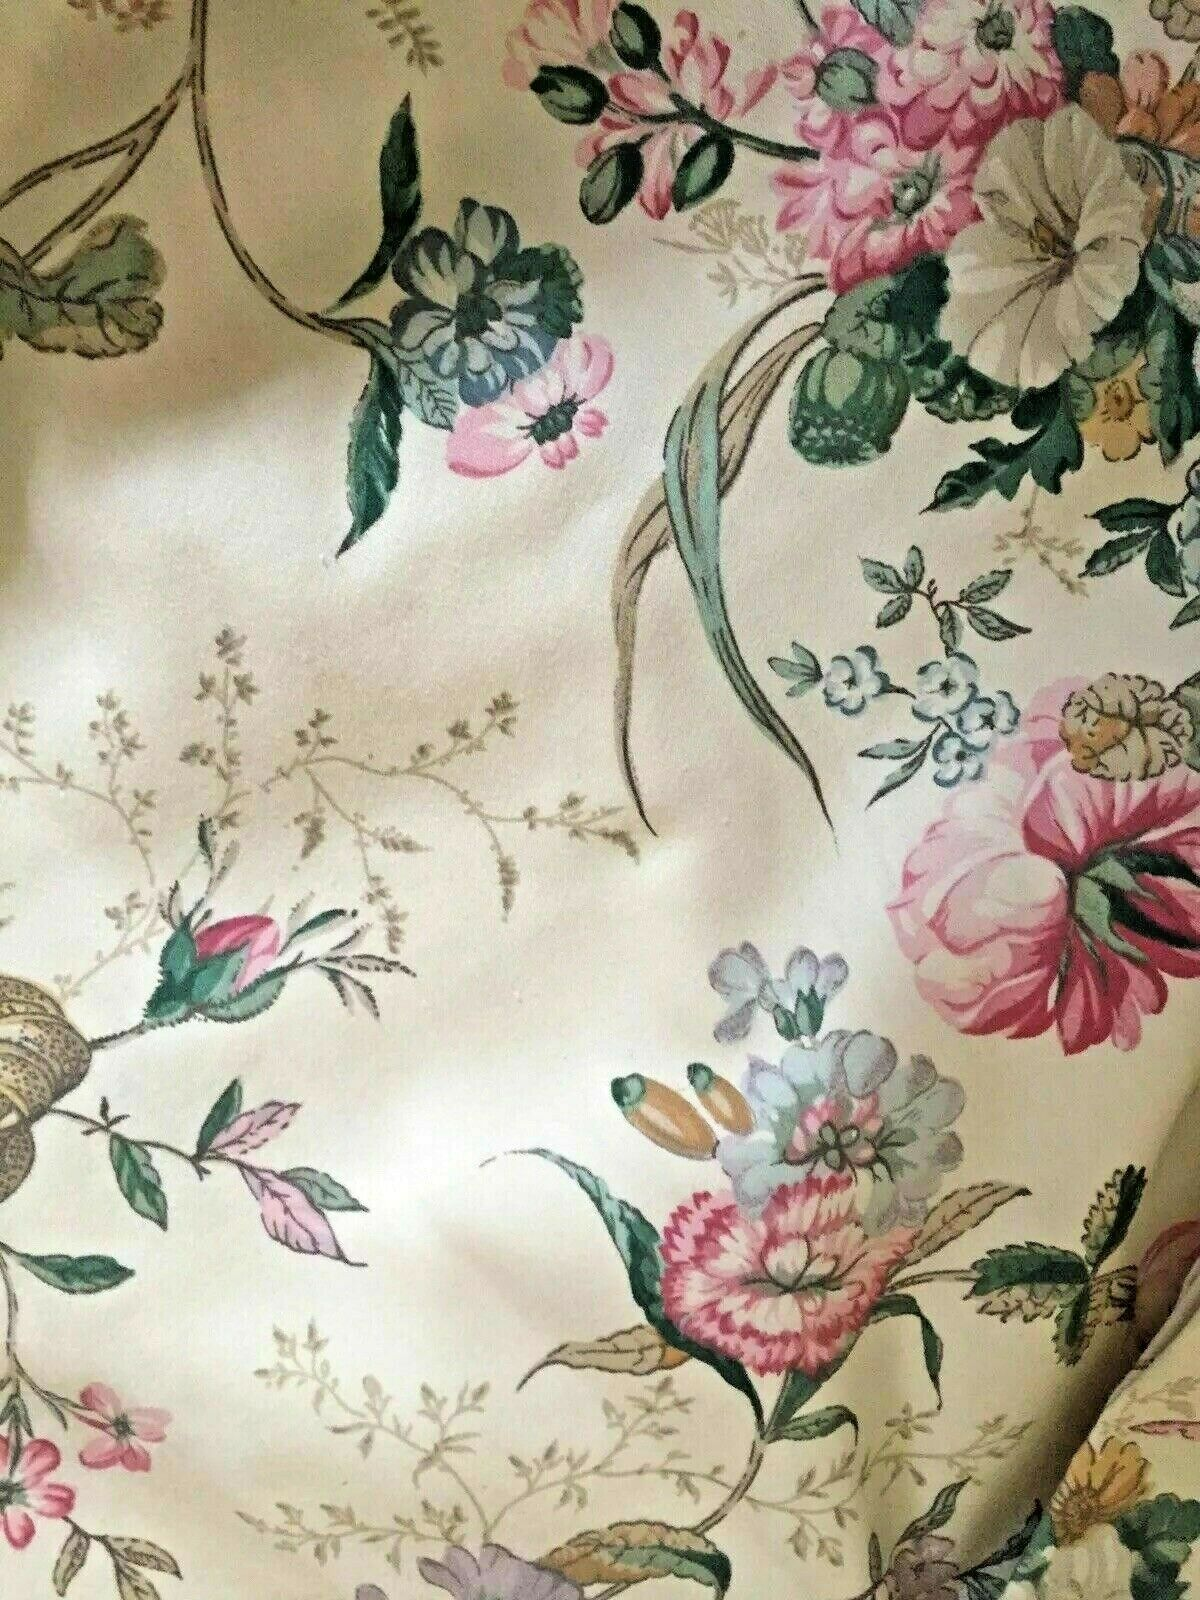 LUXUS Dorma V & A Collection Guinevere Floral Print Vorhänge Gardinen NP - 185 E